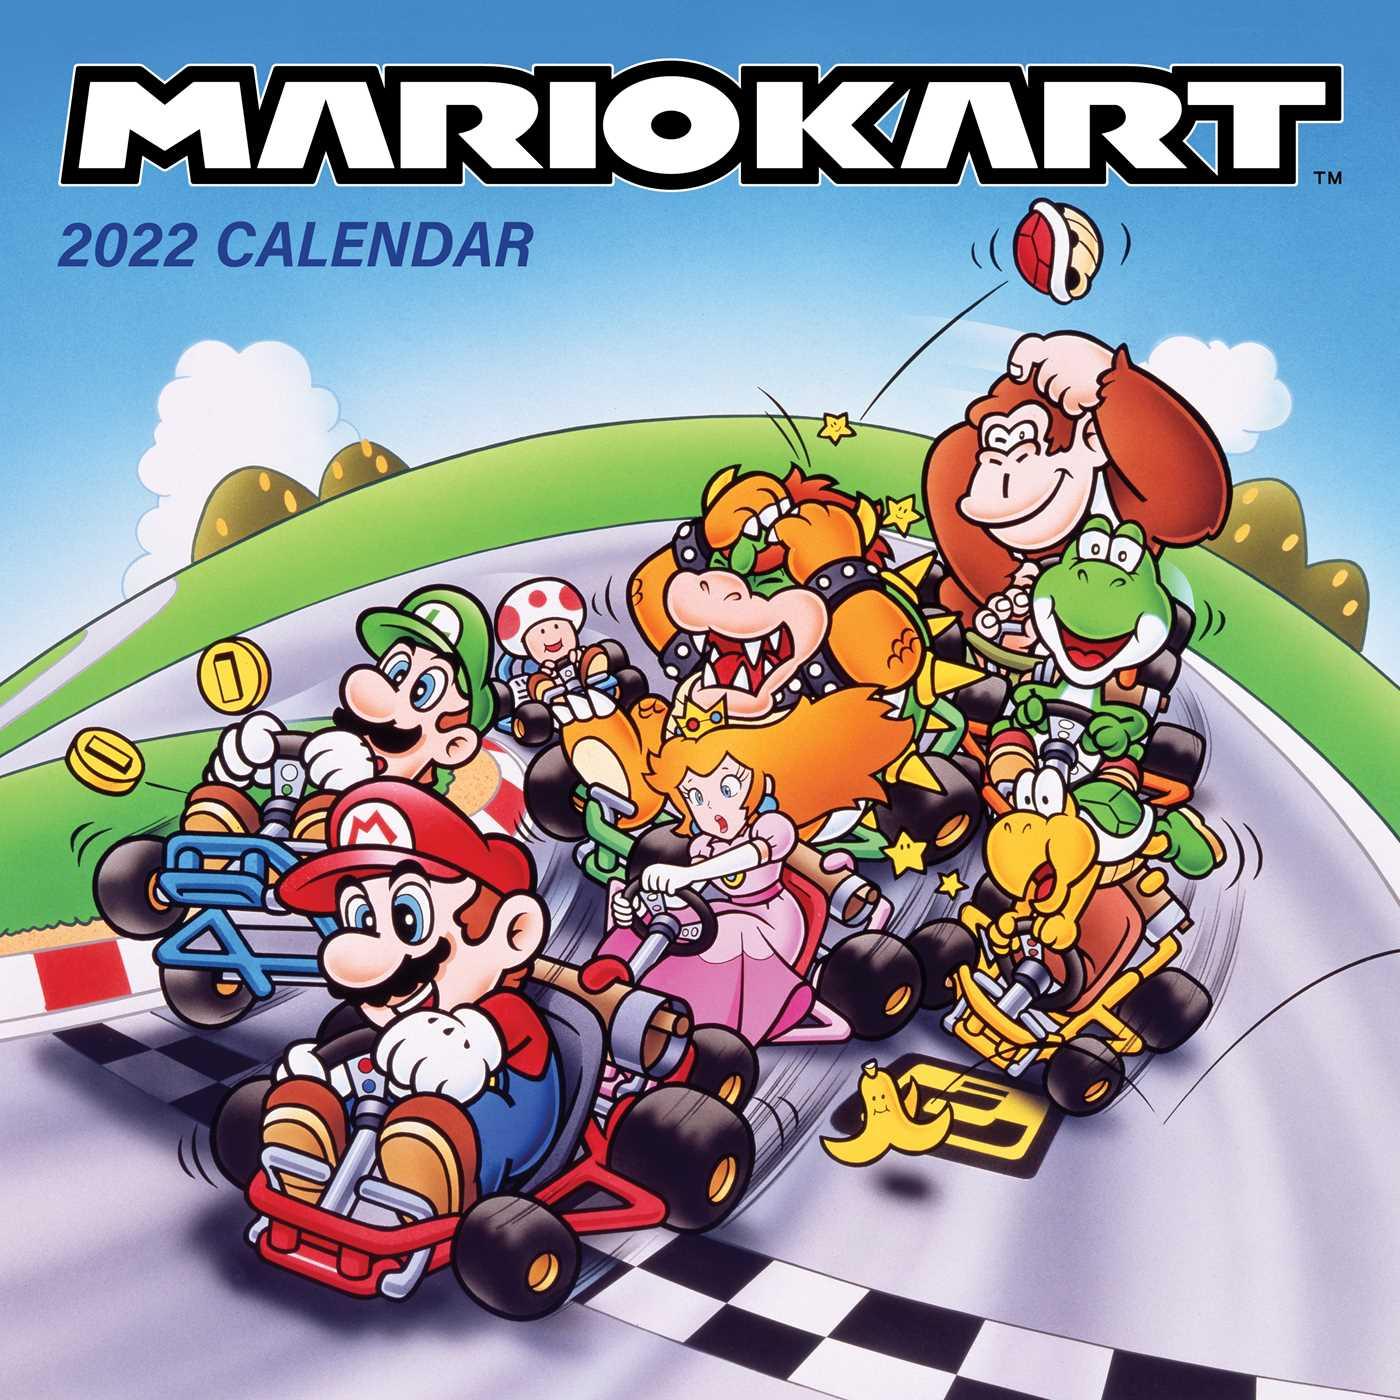 Wall Calendar 2022.Mario Kart 2022 Wall Calendar Book Summary Video Official Publisher Page Simon Schuster